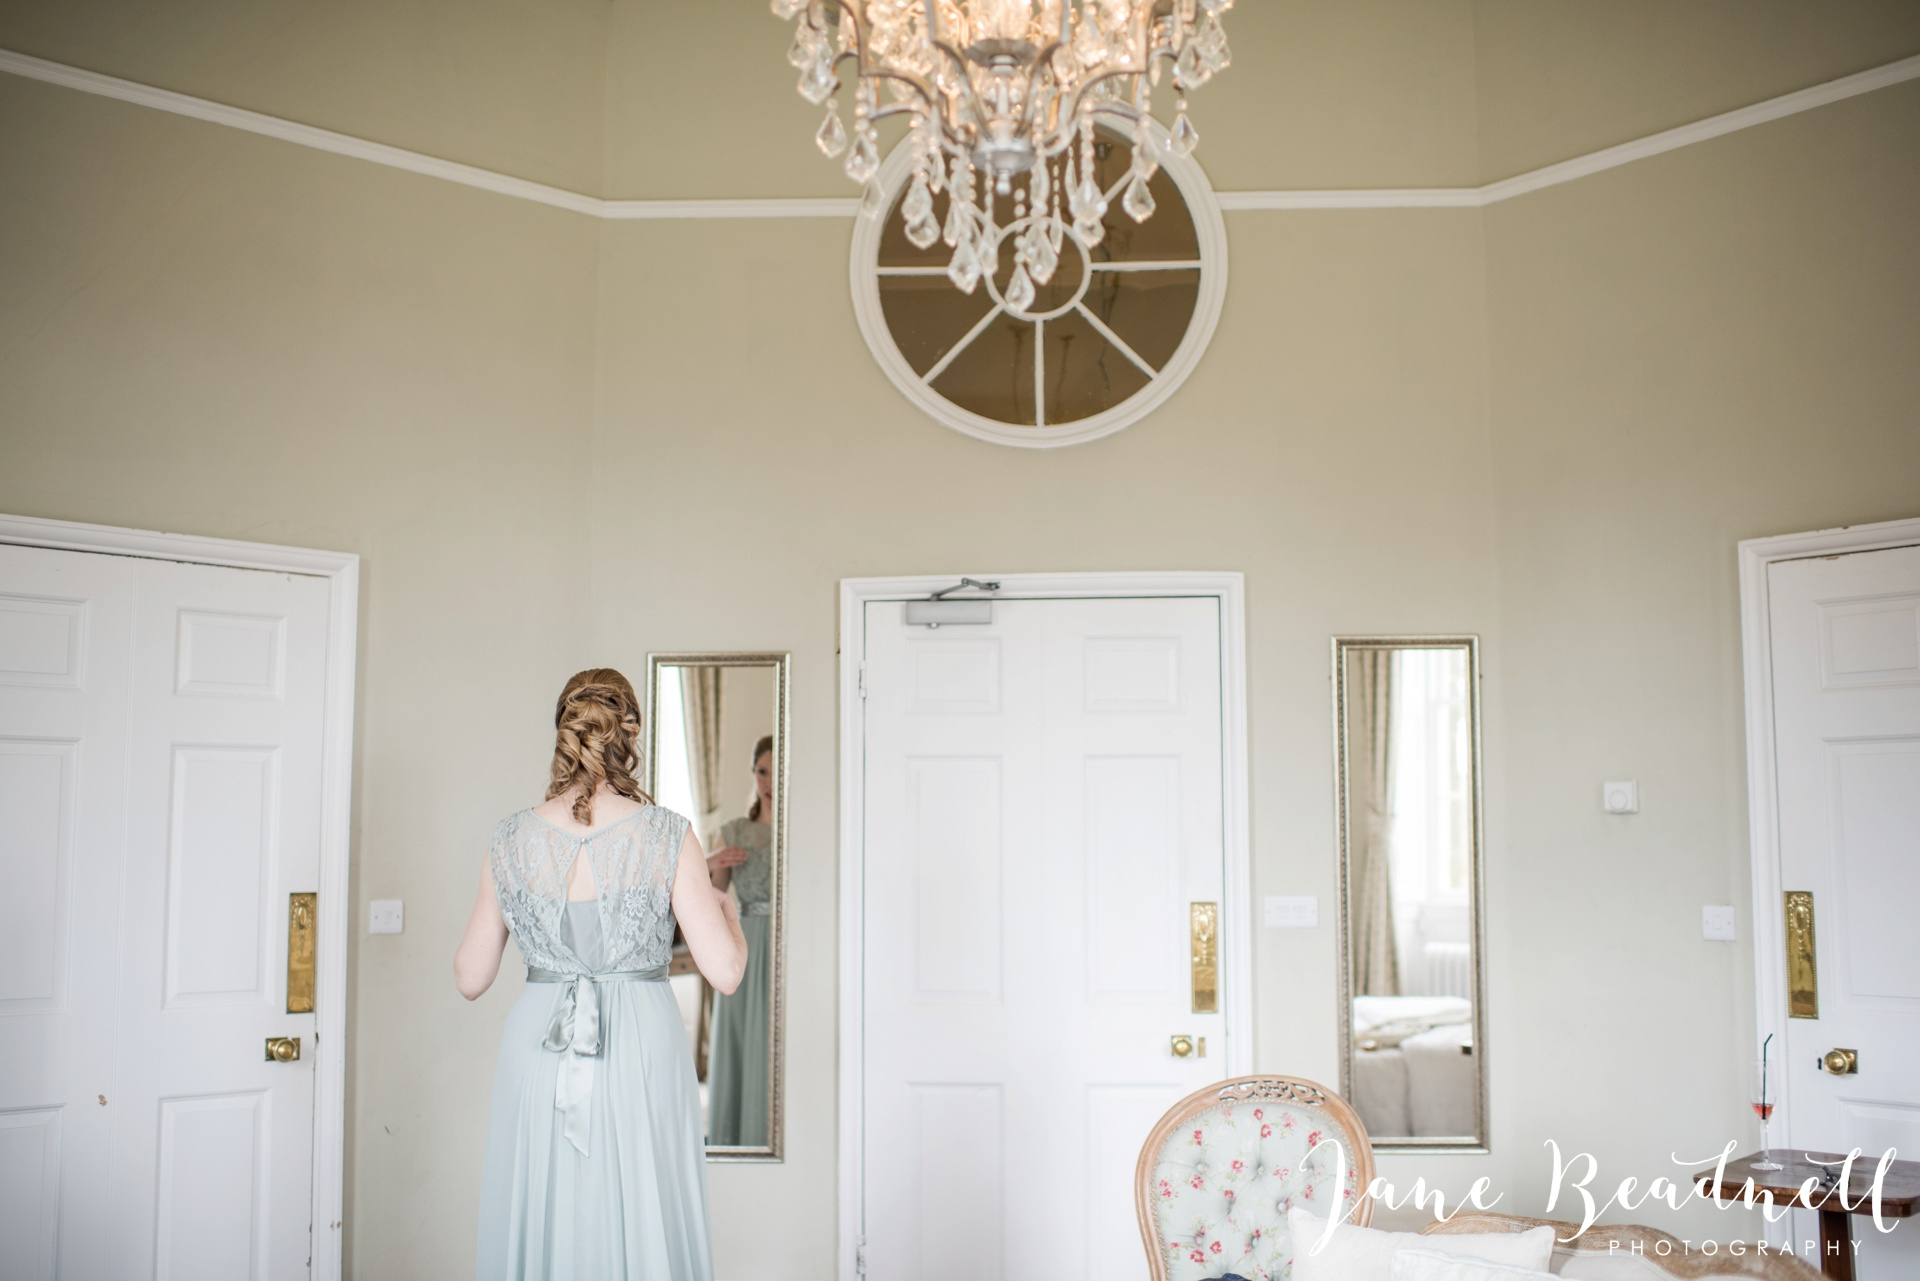 Middleton Lodge wedding photography by fine art wedding photographer Jane Beadnell_0024